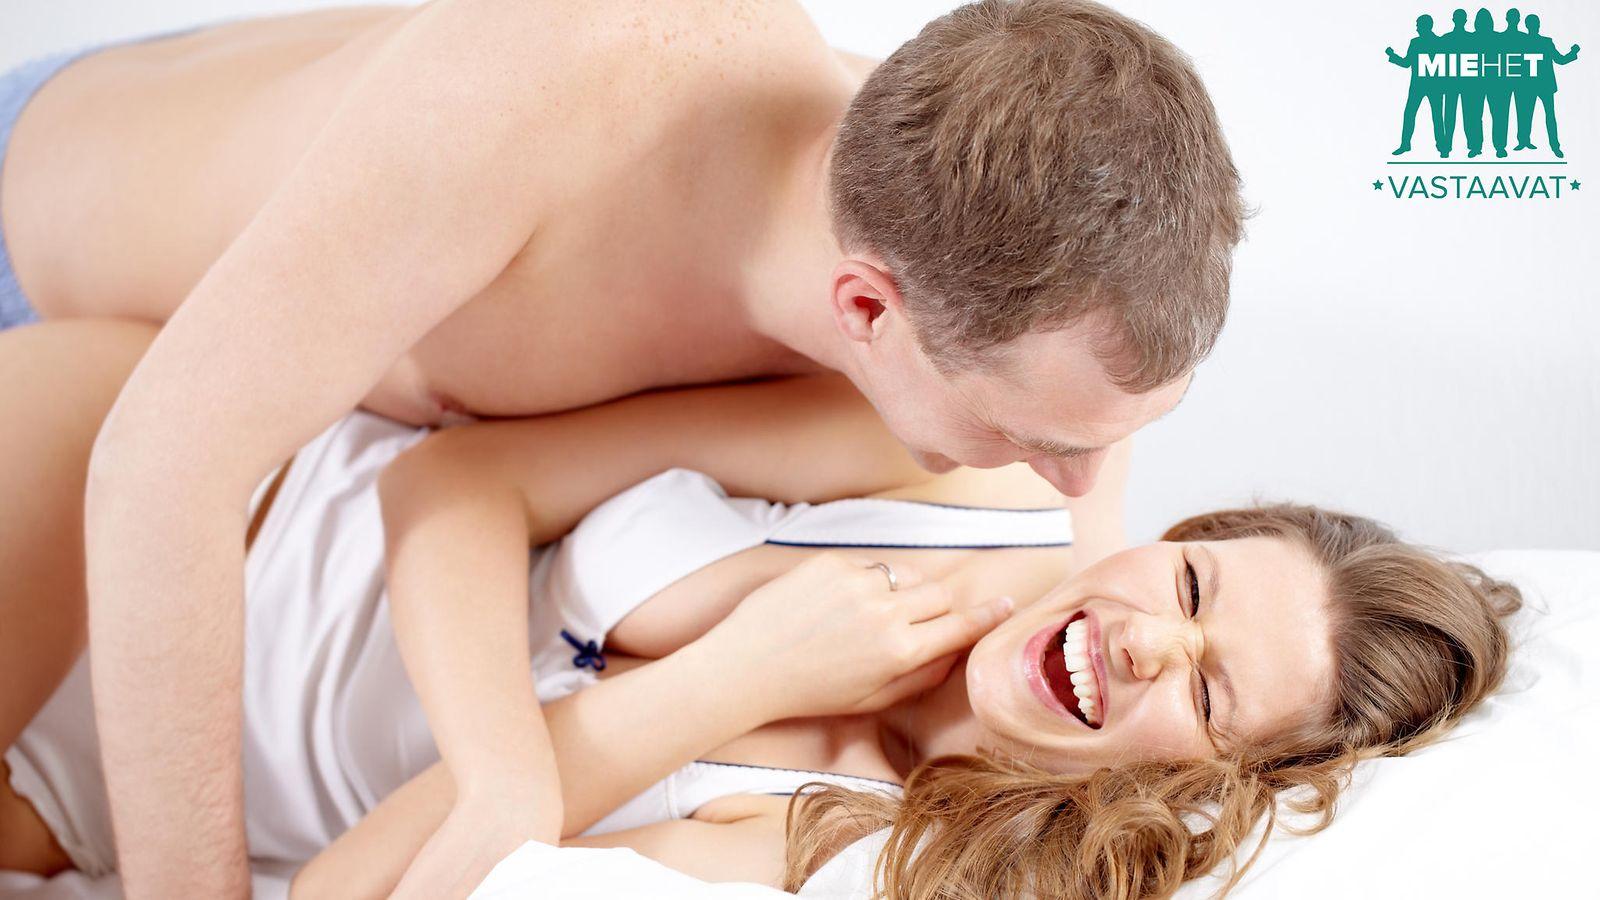 m teini seksiä POV blowjobs videot